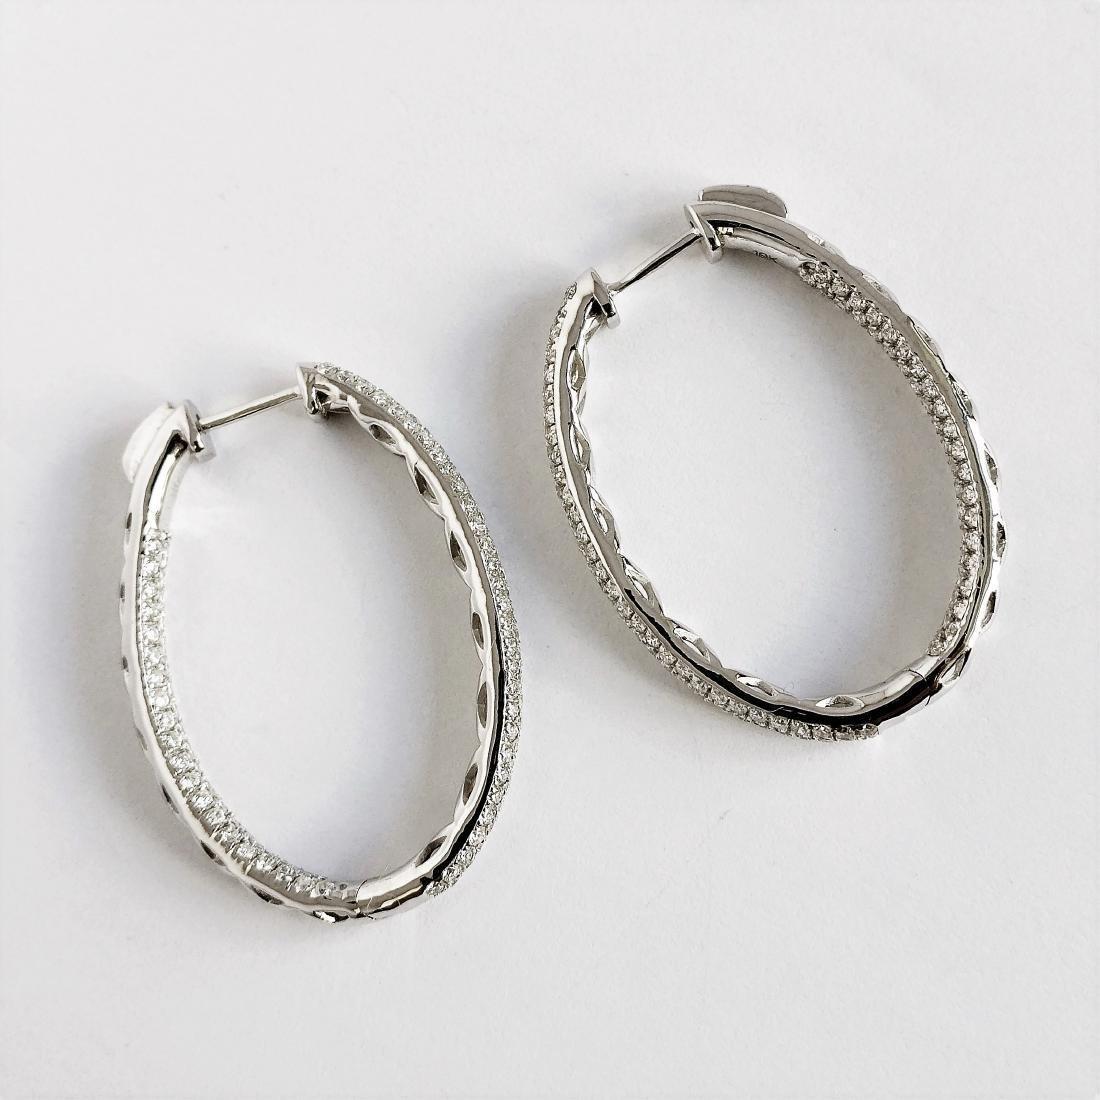 Ladies Earrings with Diamonds total 5.84 ct - 9